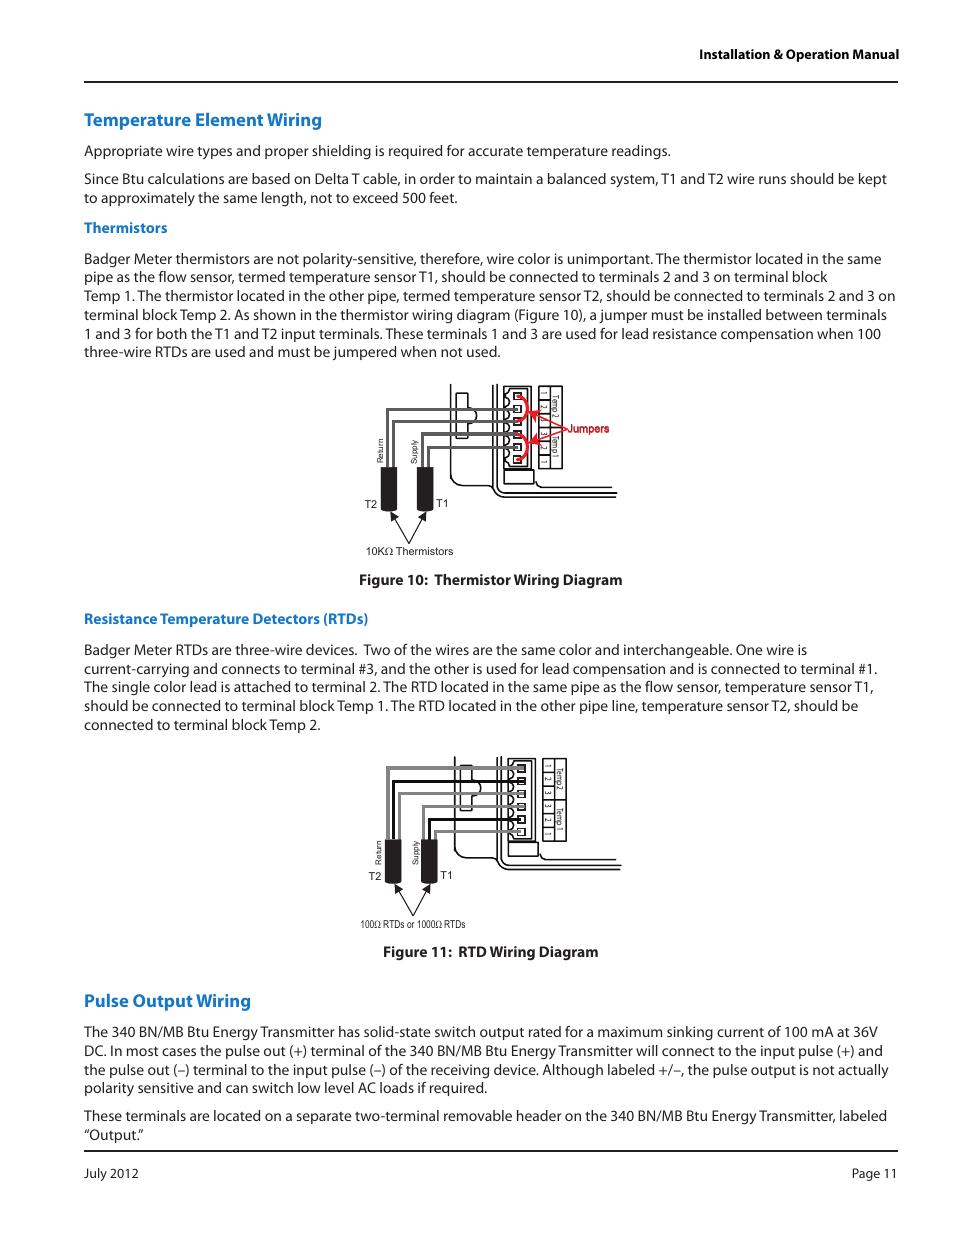 Temperature element wiring, Thermistors, Resistance temperature detectors  (rtds) | Badger Meter 340 BN/MB Btu Energy Transmitter User Manual | Page  11 / 28